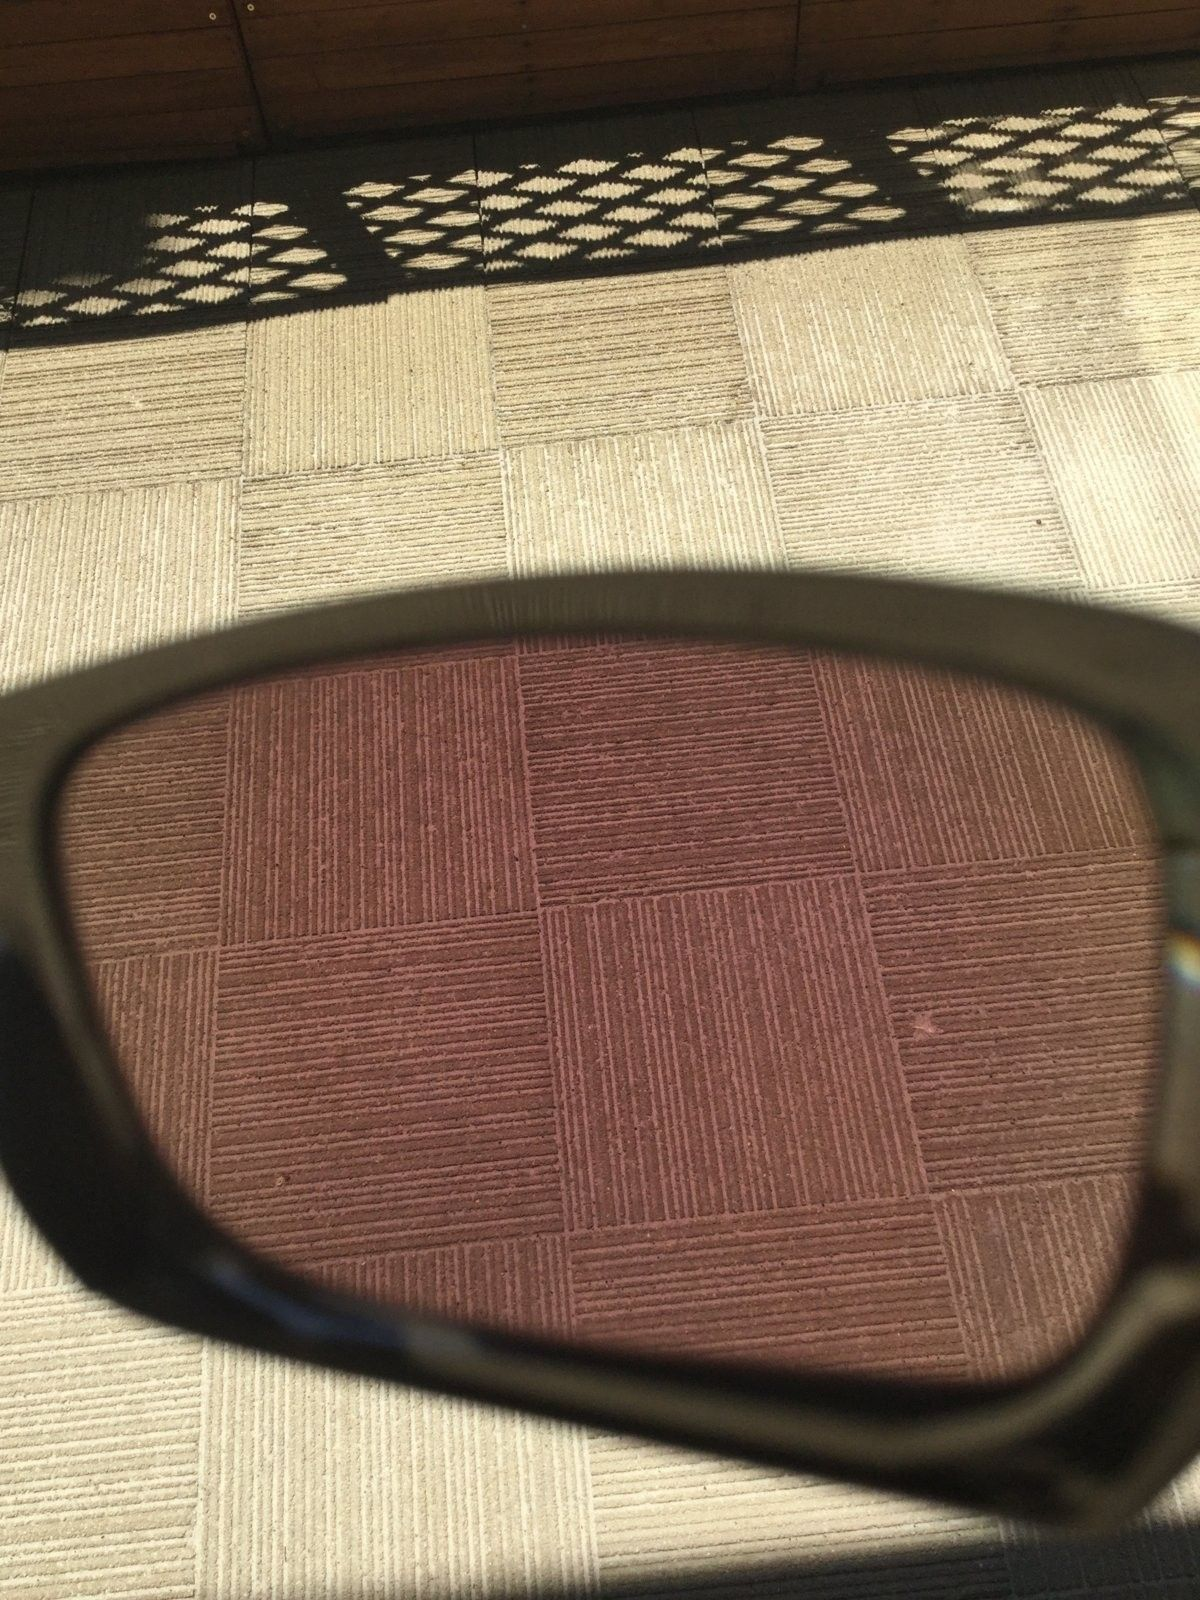 Help identify this lens - image.jpeg